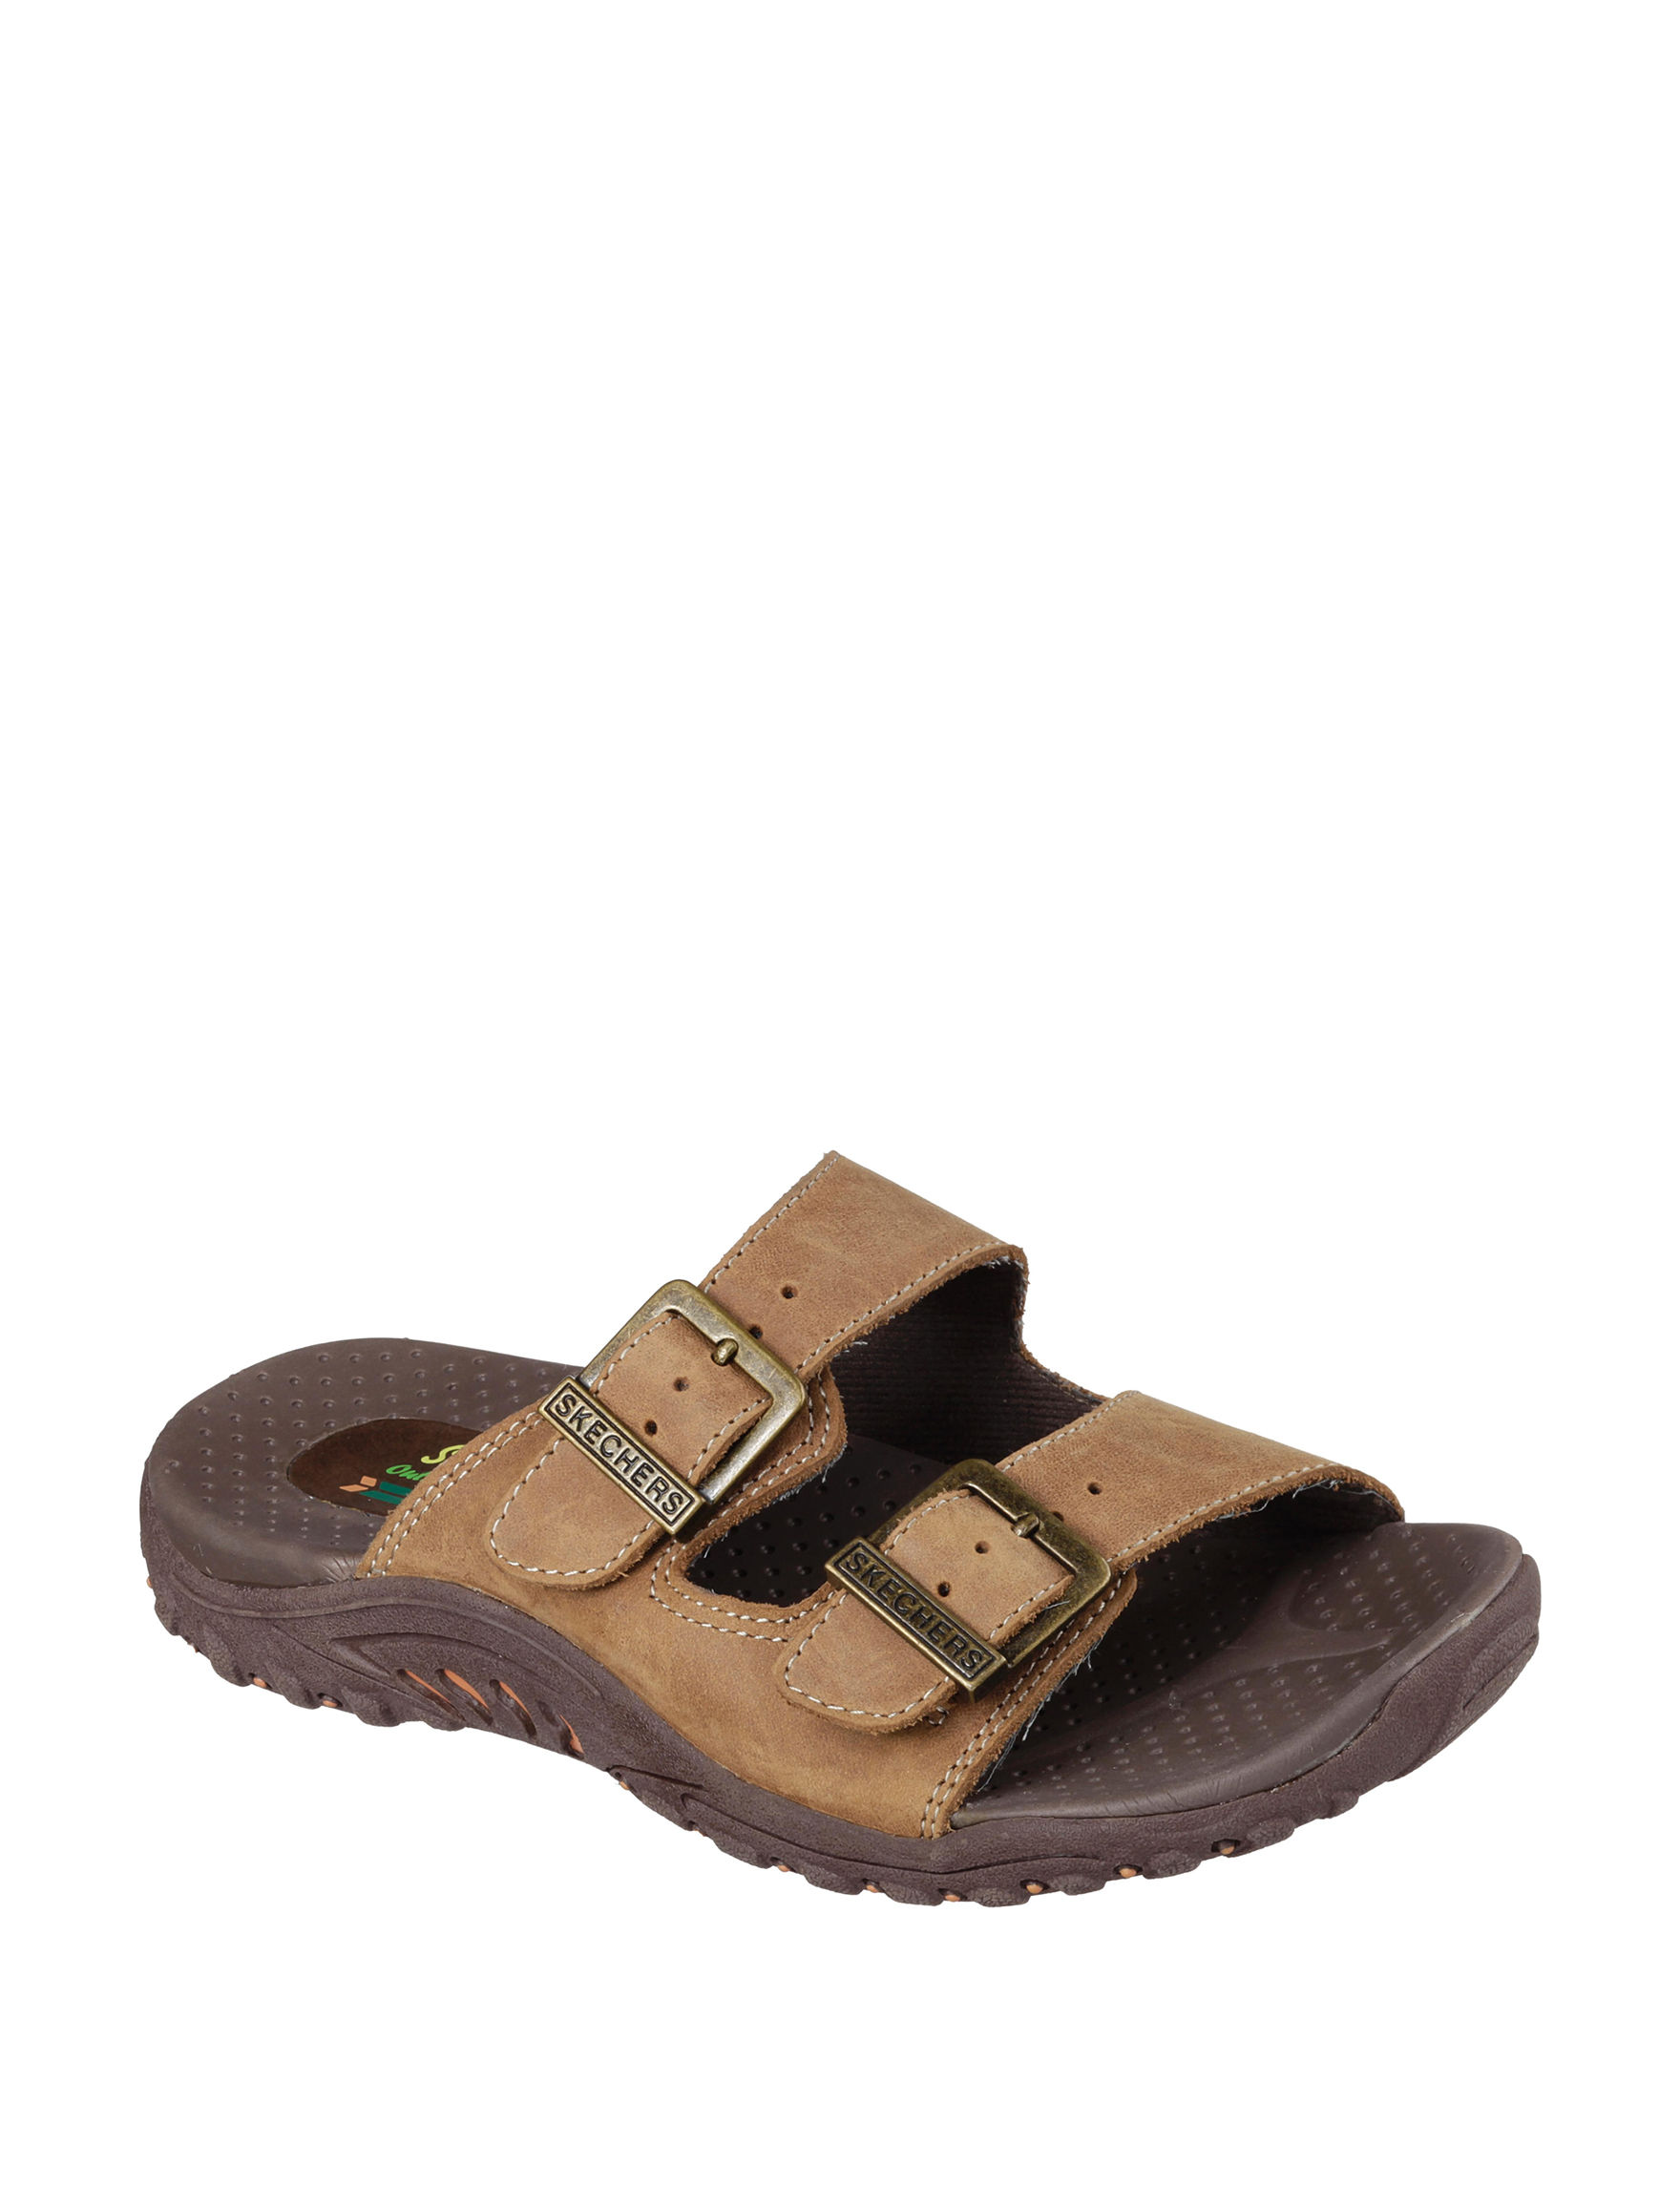 Skechers White Flat Sandals Sport Sandals Comfort